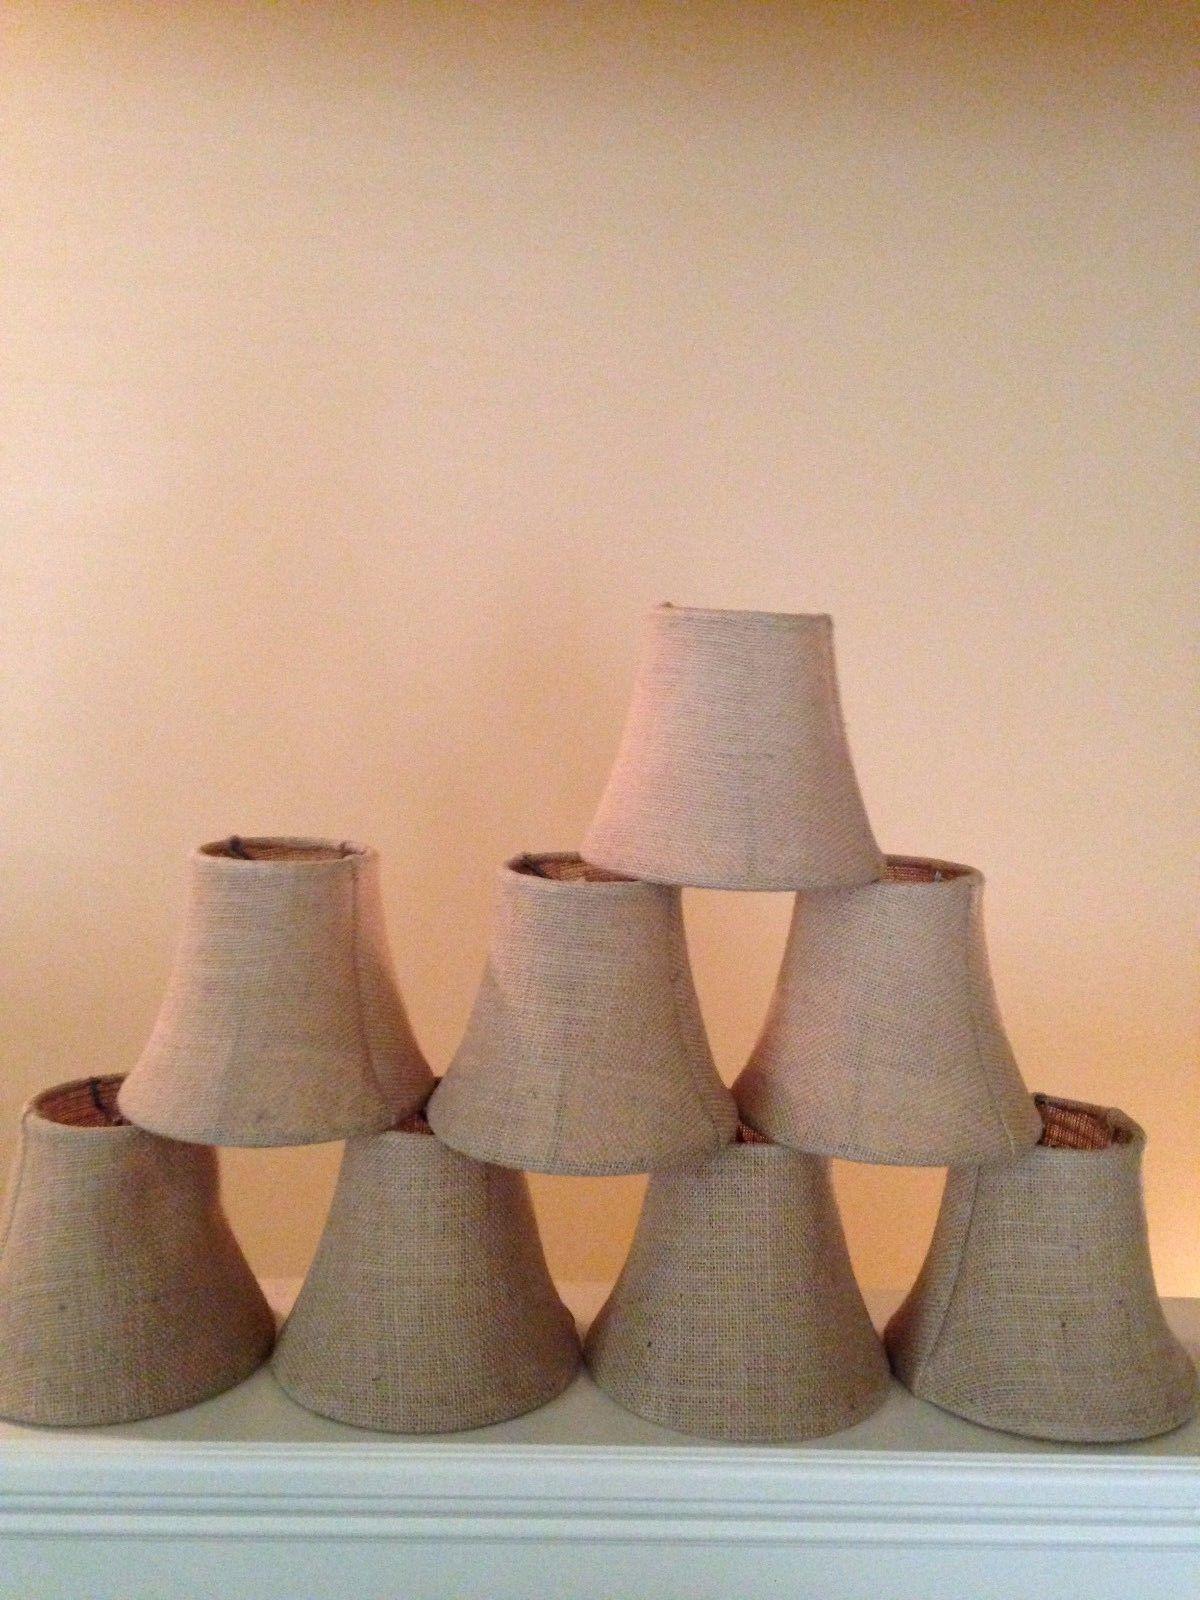 Lamp shades 20708 pottery barn set of 8 burlap chandelier shades lamp shades 20708 pottery barn set of 8 burlap chandelier shades natural new arubaitofo Choice Image